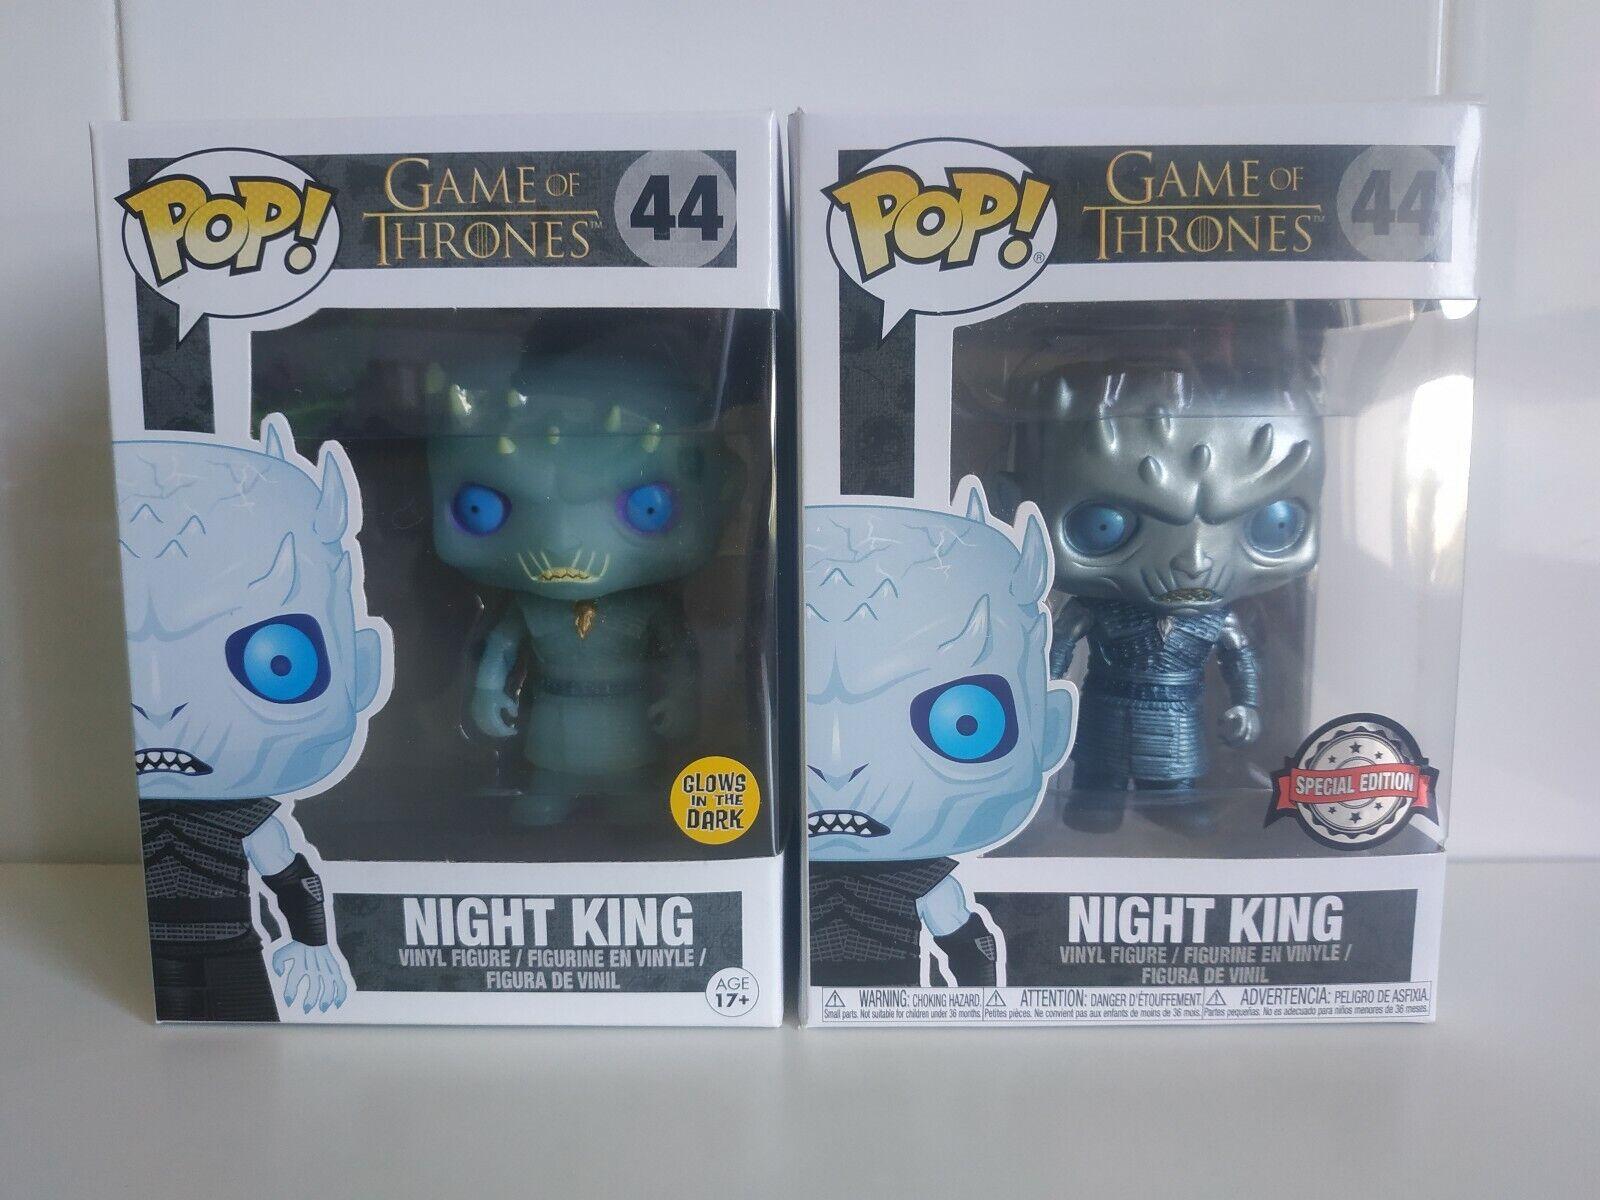 Funko pop Night King Metallic &Glows-Pack 2-Game of thrones Exclusives-VER FOTOS